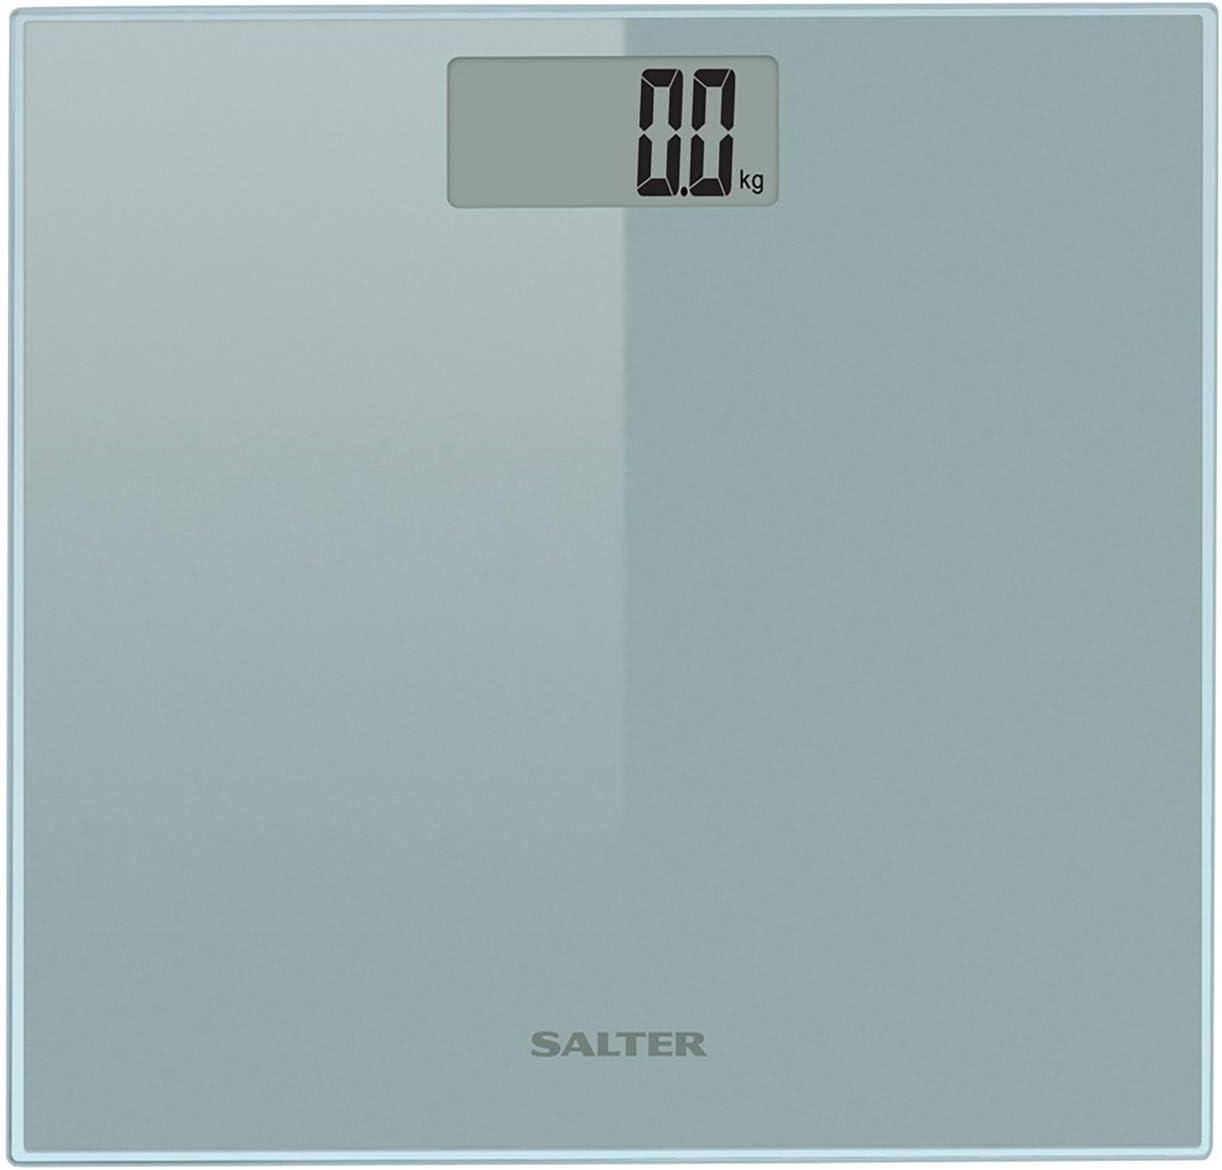 Salter Báscula de baño electrónica, 8 mm de vidrio templado, Pantalla de fácil lectura, Garantía 15 años